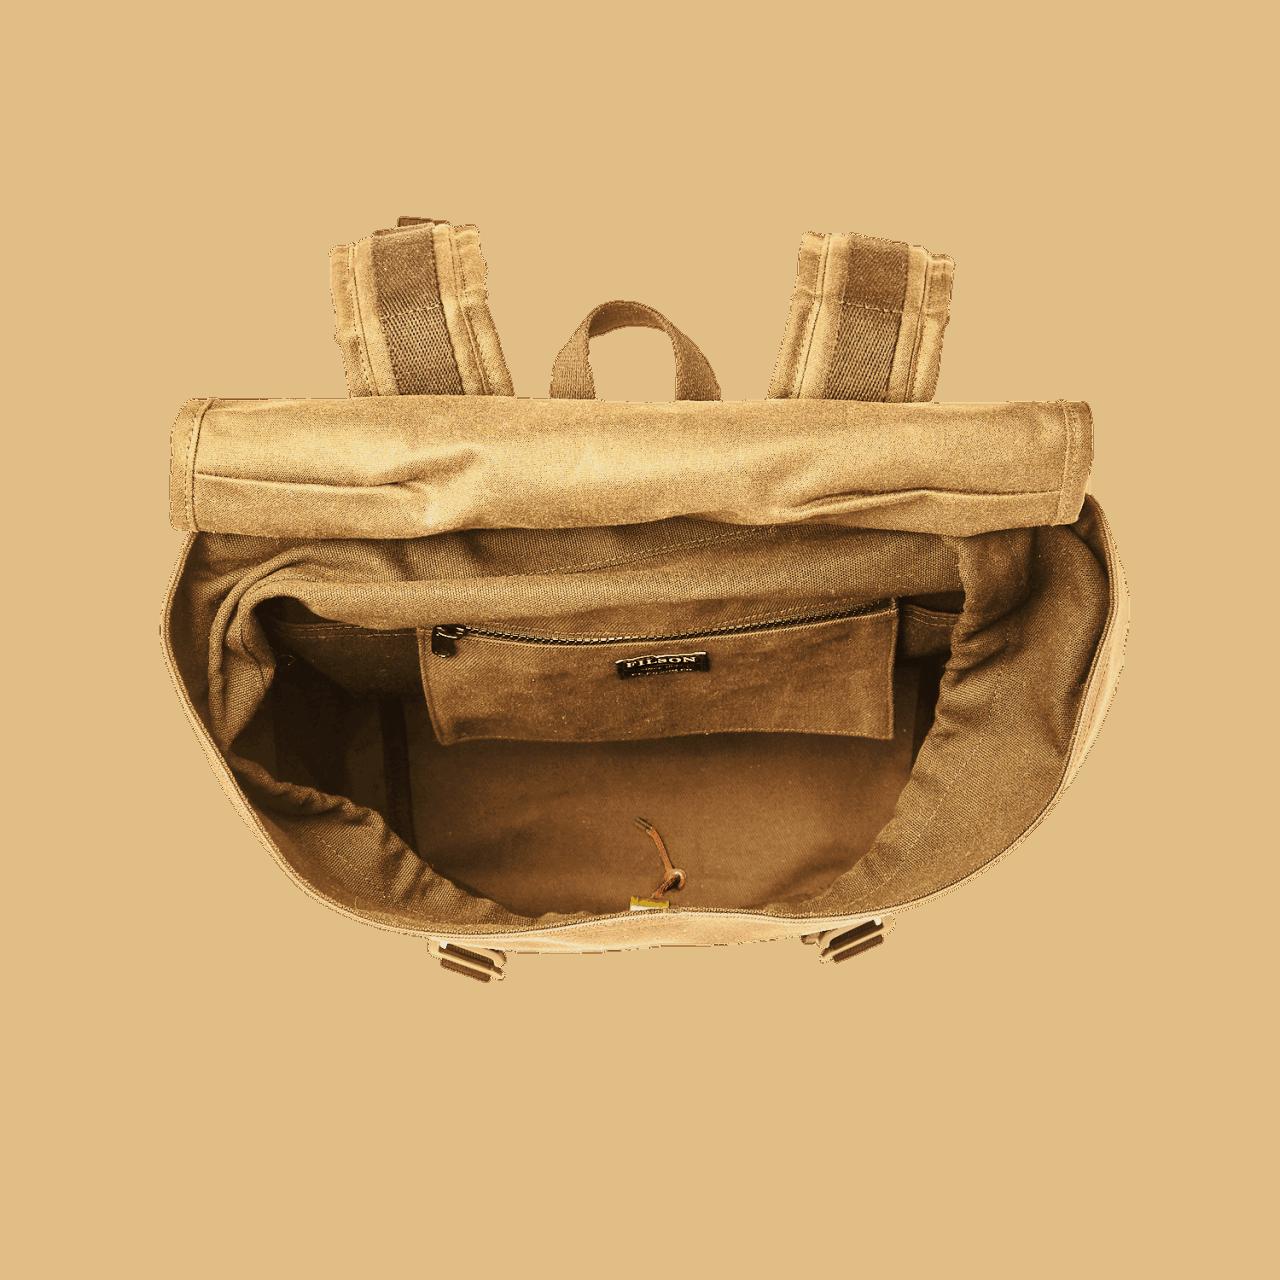 Filson Rugged Twill Ranger Backpack - Tan